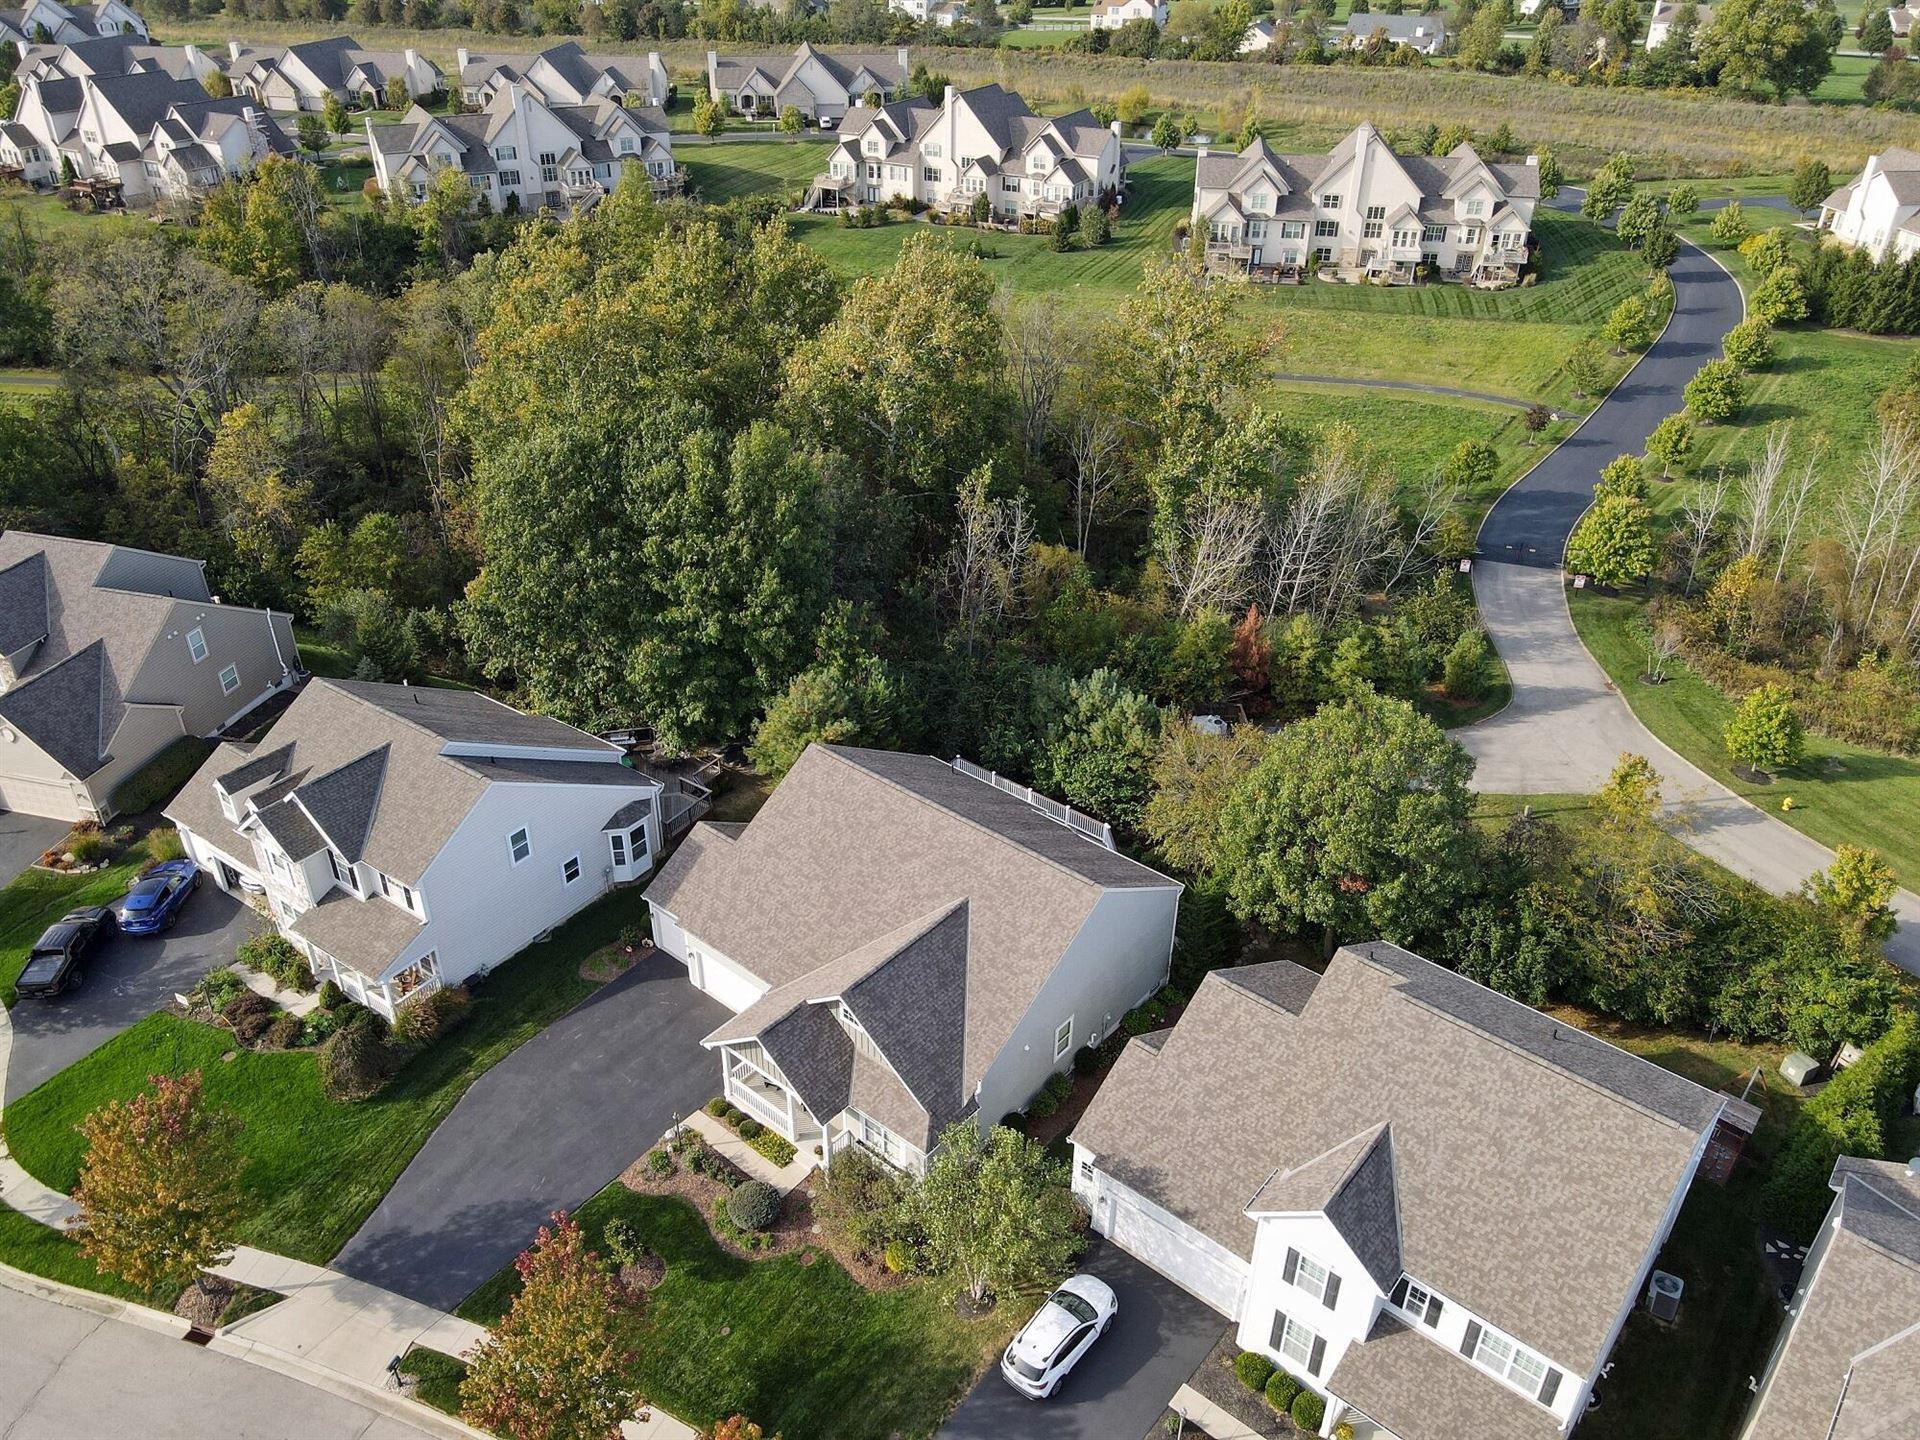 Photo of 4818 Pleasant Creek Court, Powell, OH 43065 (MLS # 221040976)